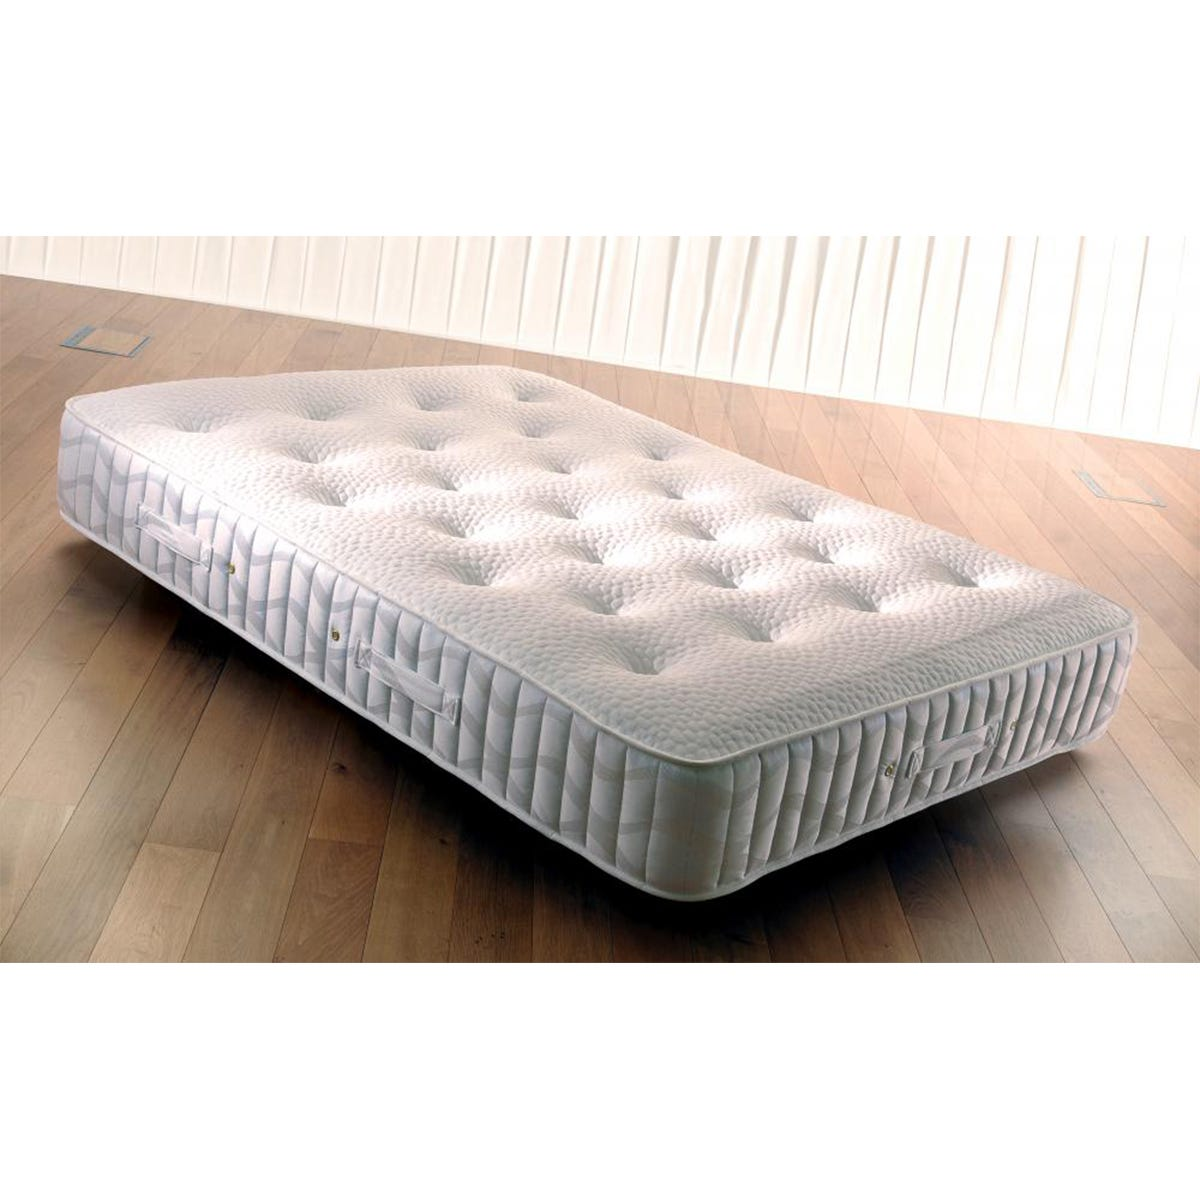 Jago Orthopaedic Memory Foam King Size Mattress